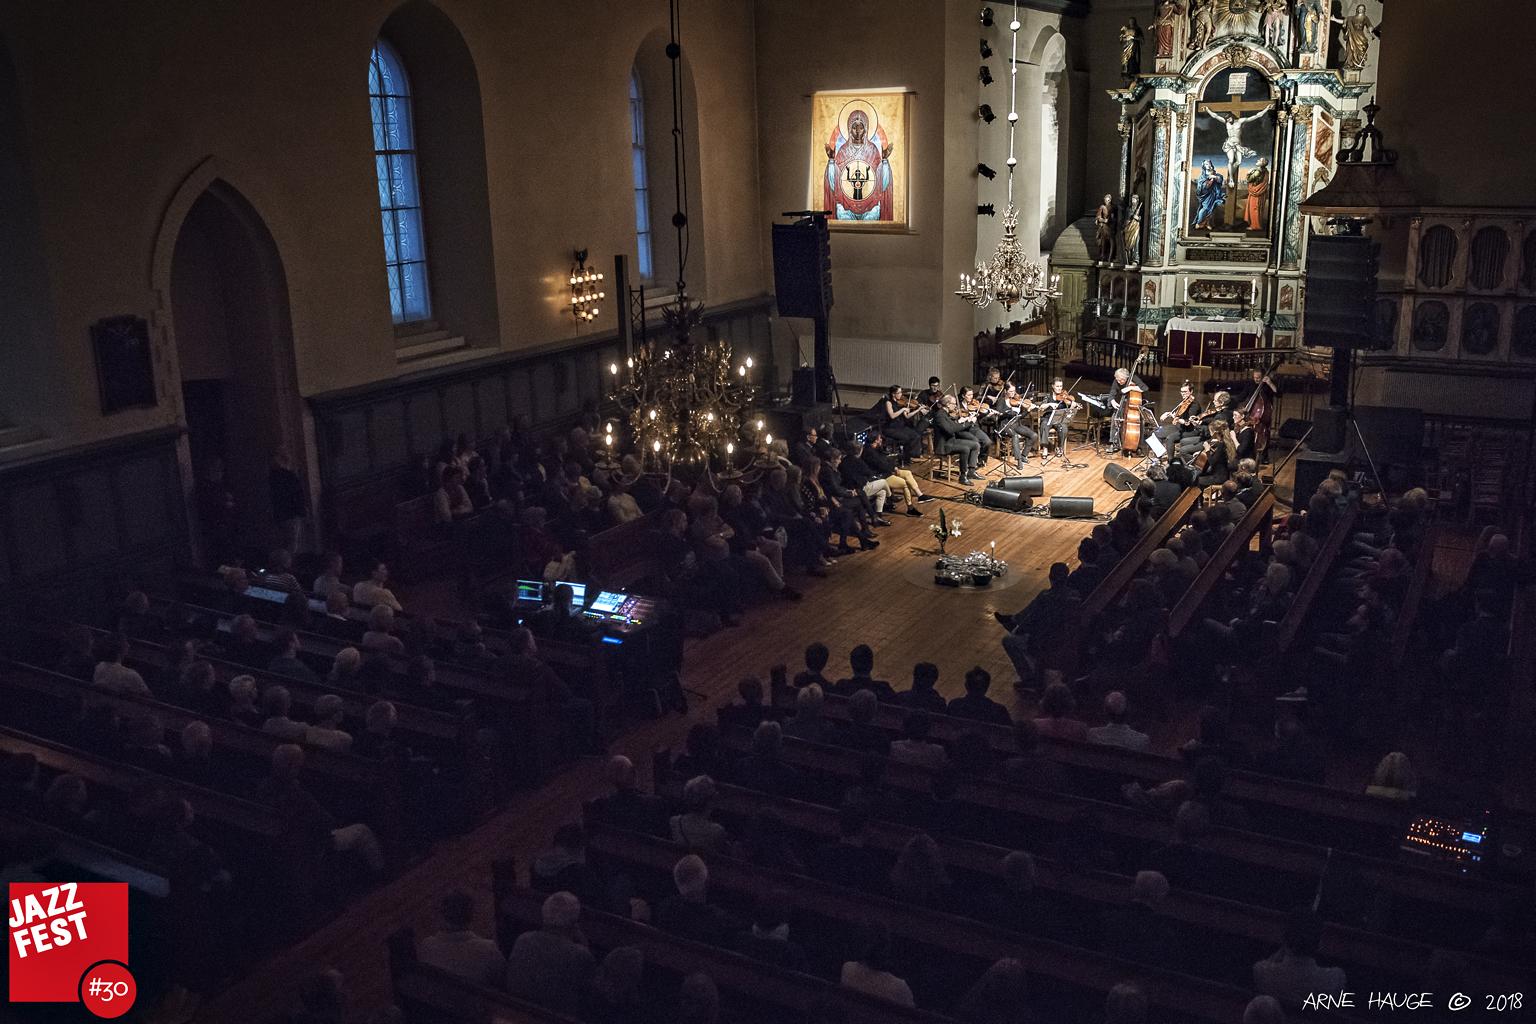 180511_Arild Andersen & TrondheimSolistene @ Vår Frue Kirke_007.jpg